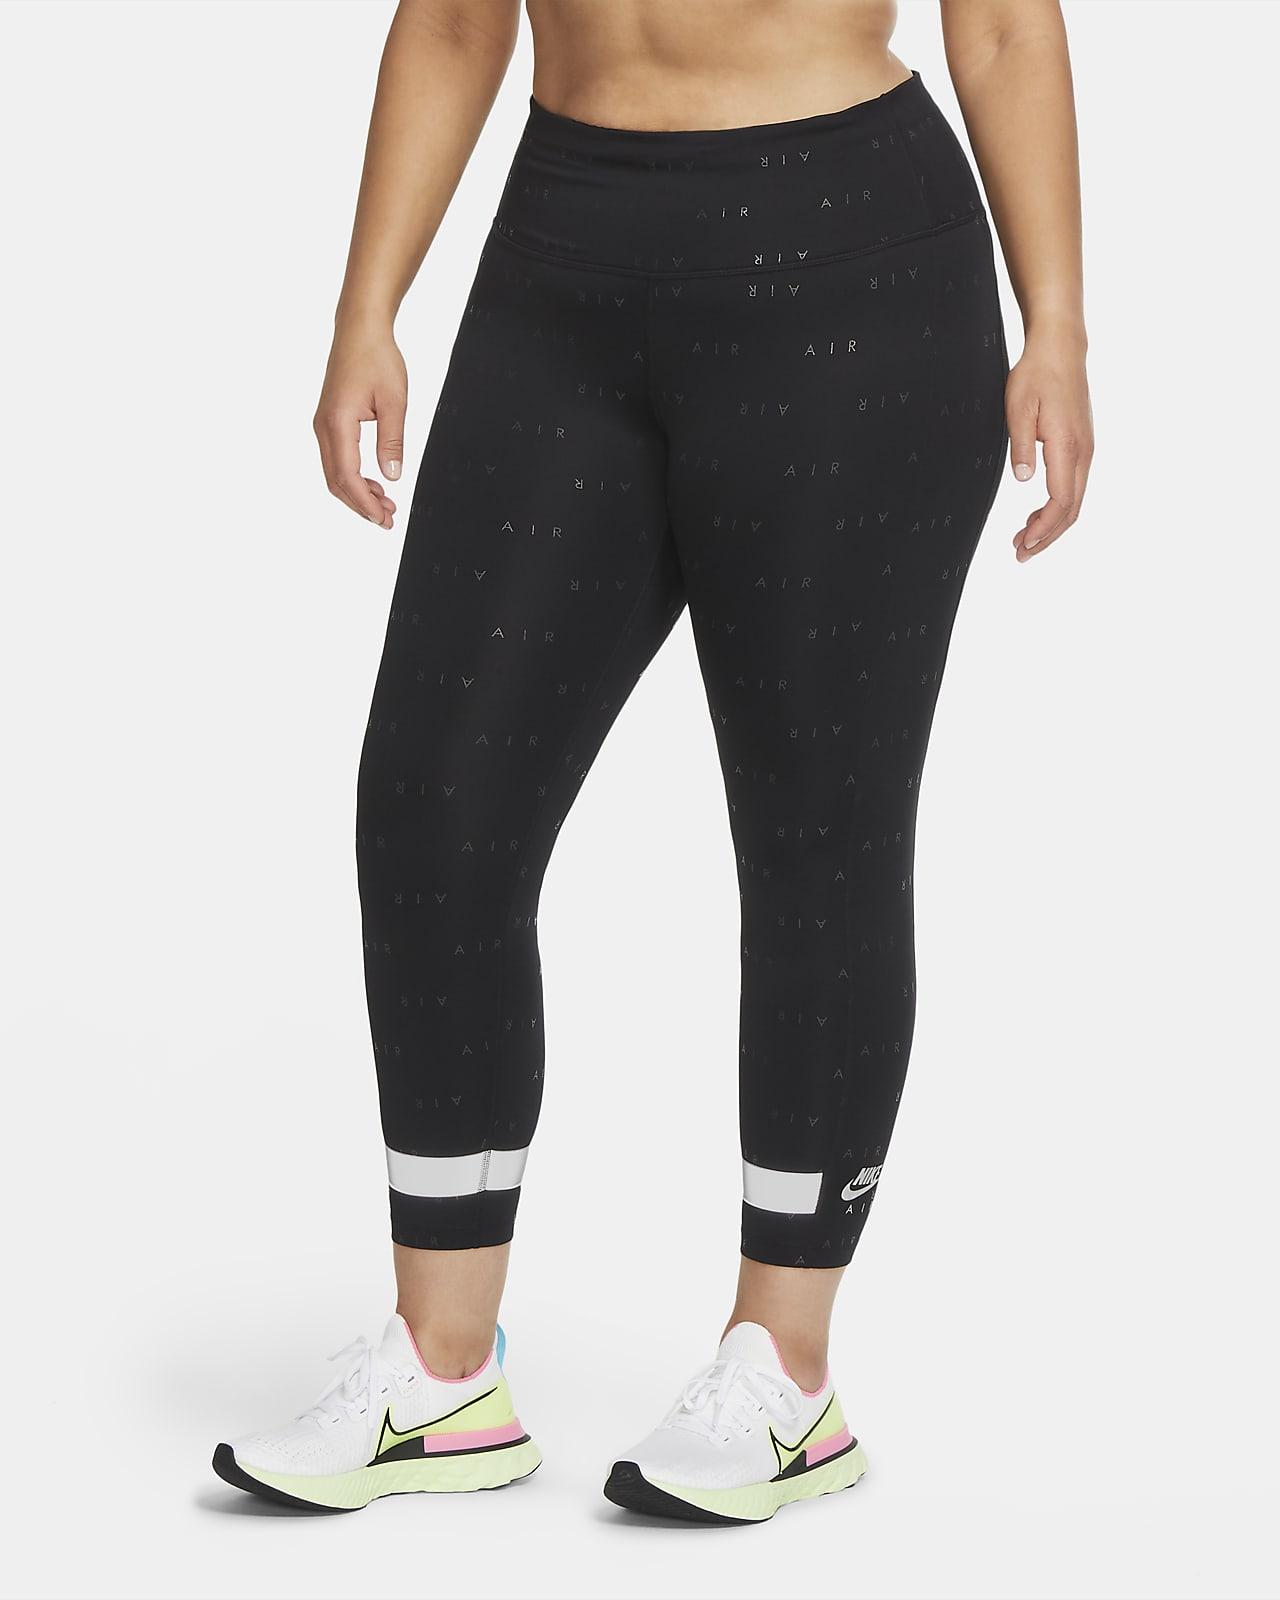 Leggings de running a 7/8 de cintura subida Nike Air para mulher (tamanho Plus)